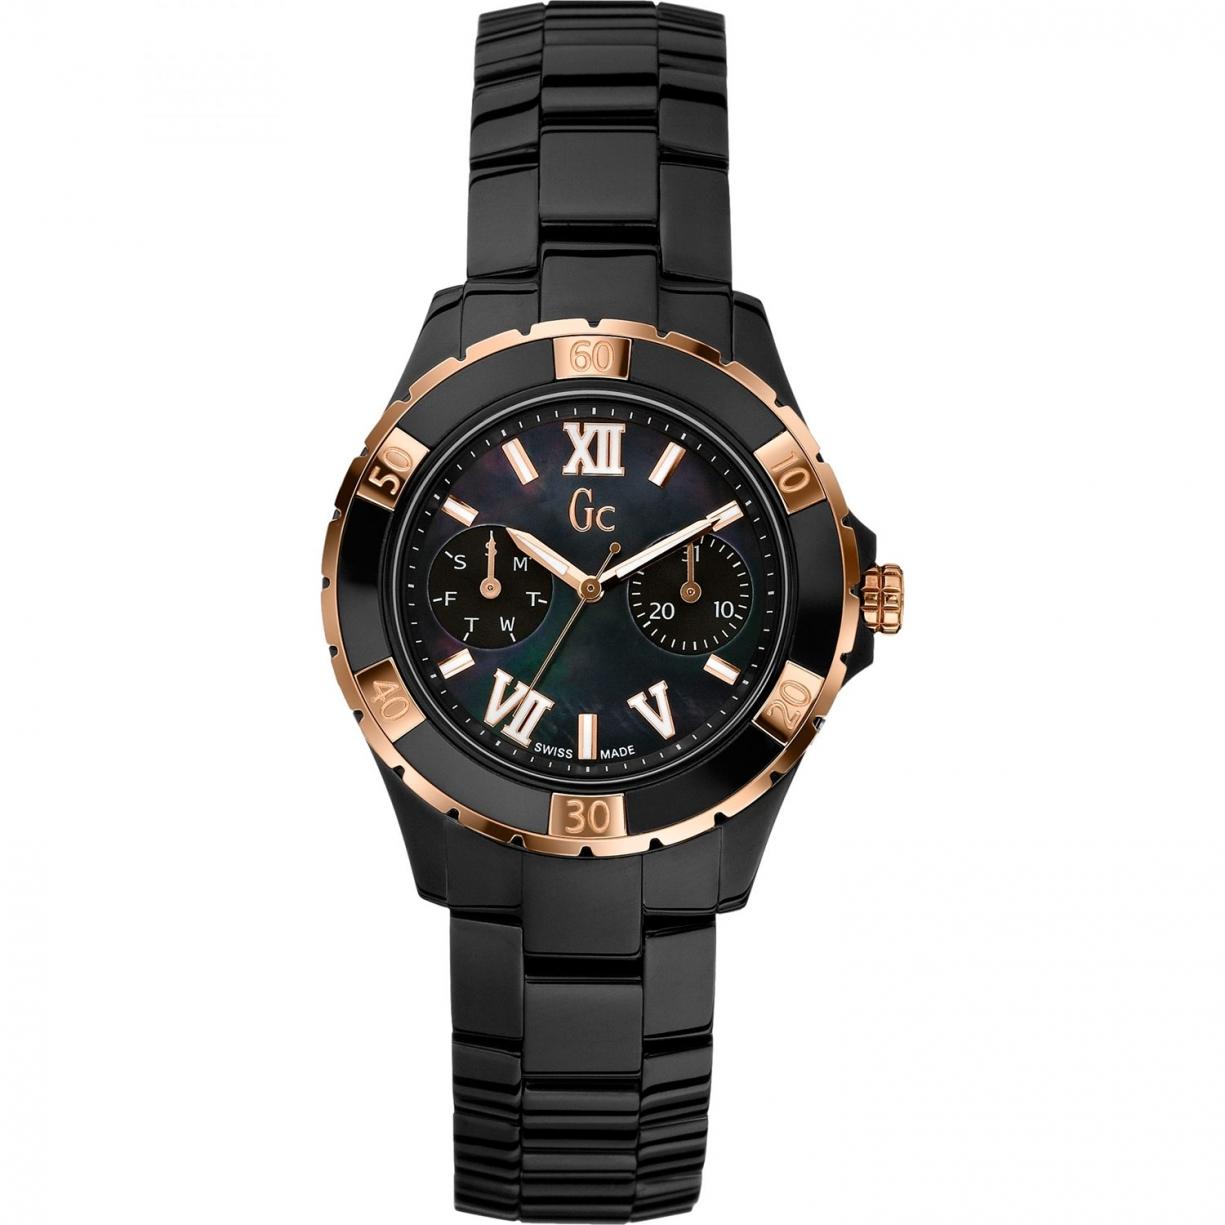 165247814a7c Reloj De Pulsera Guess Analogico Para Mujer. Modelo X69004l2s